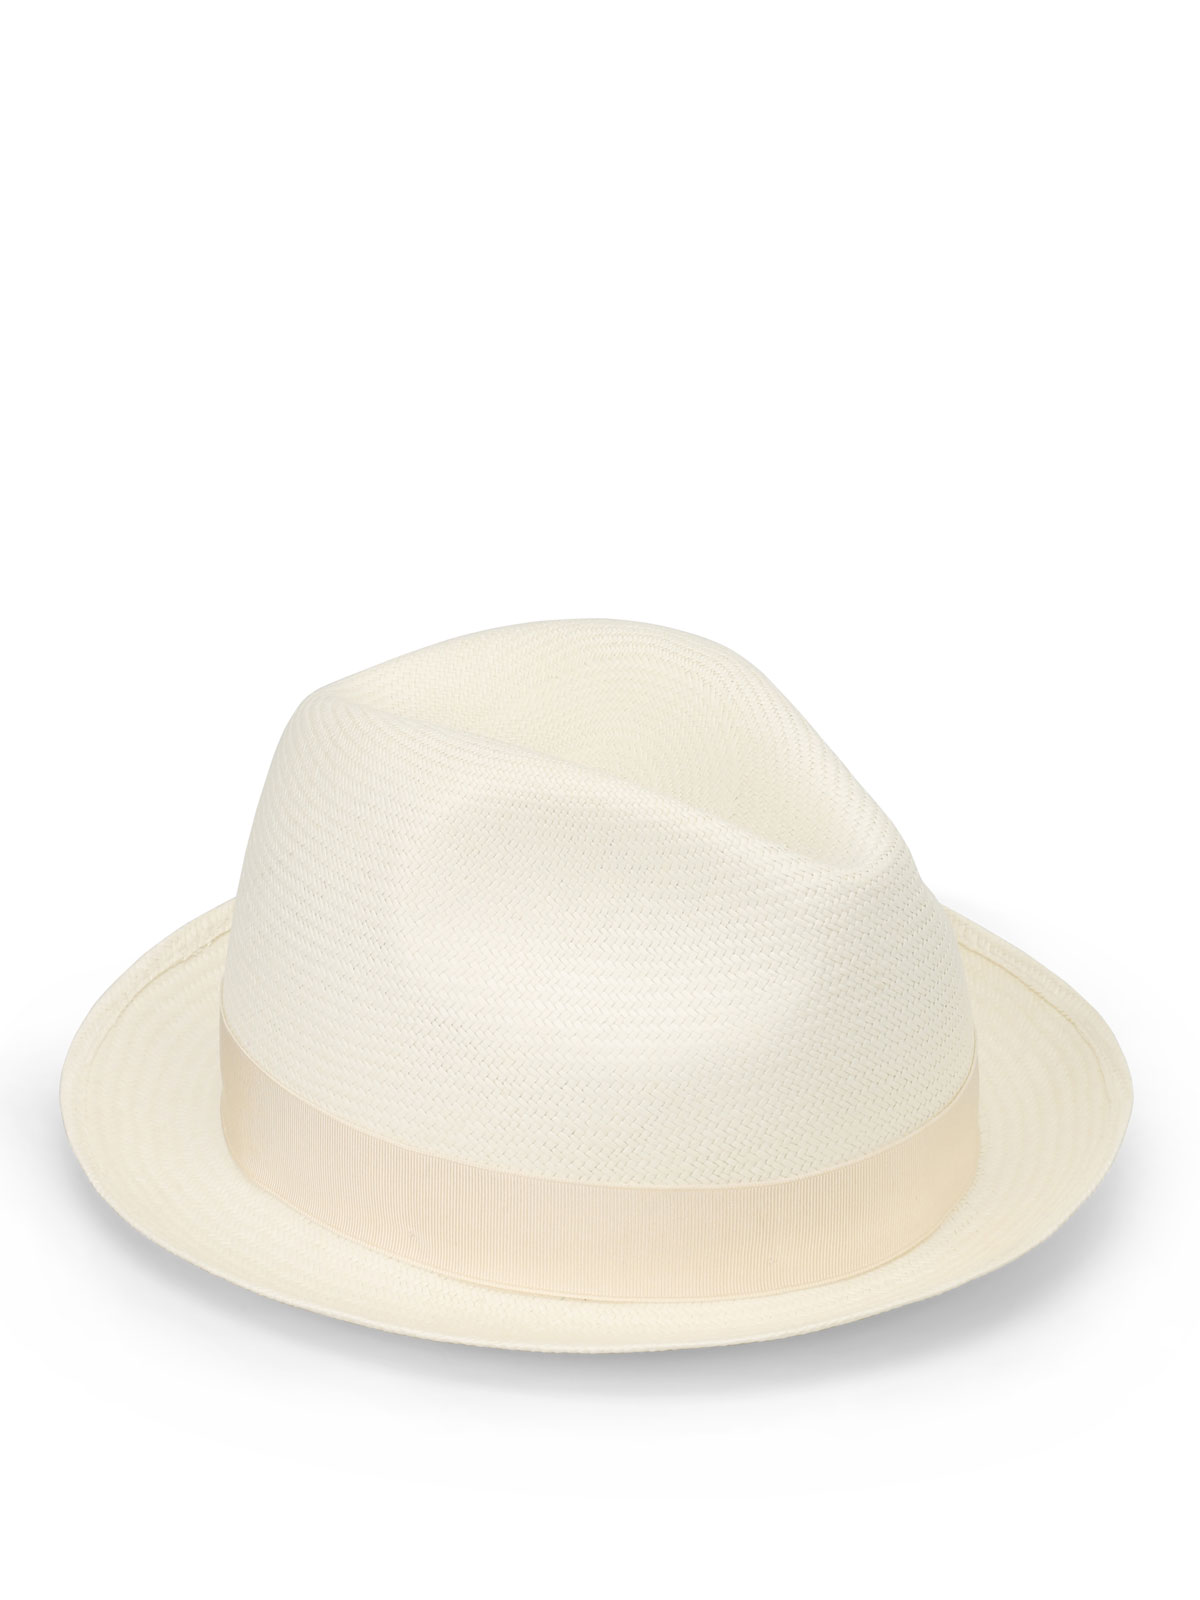 The Top Quality Panama Hat By Borsalino c8c90ce92cc9